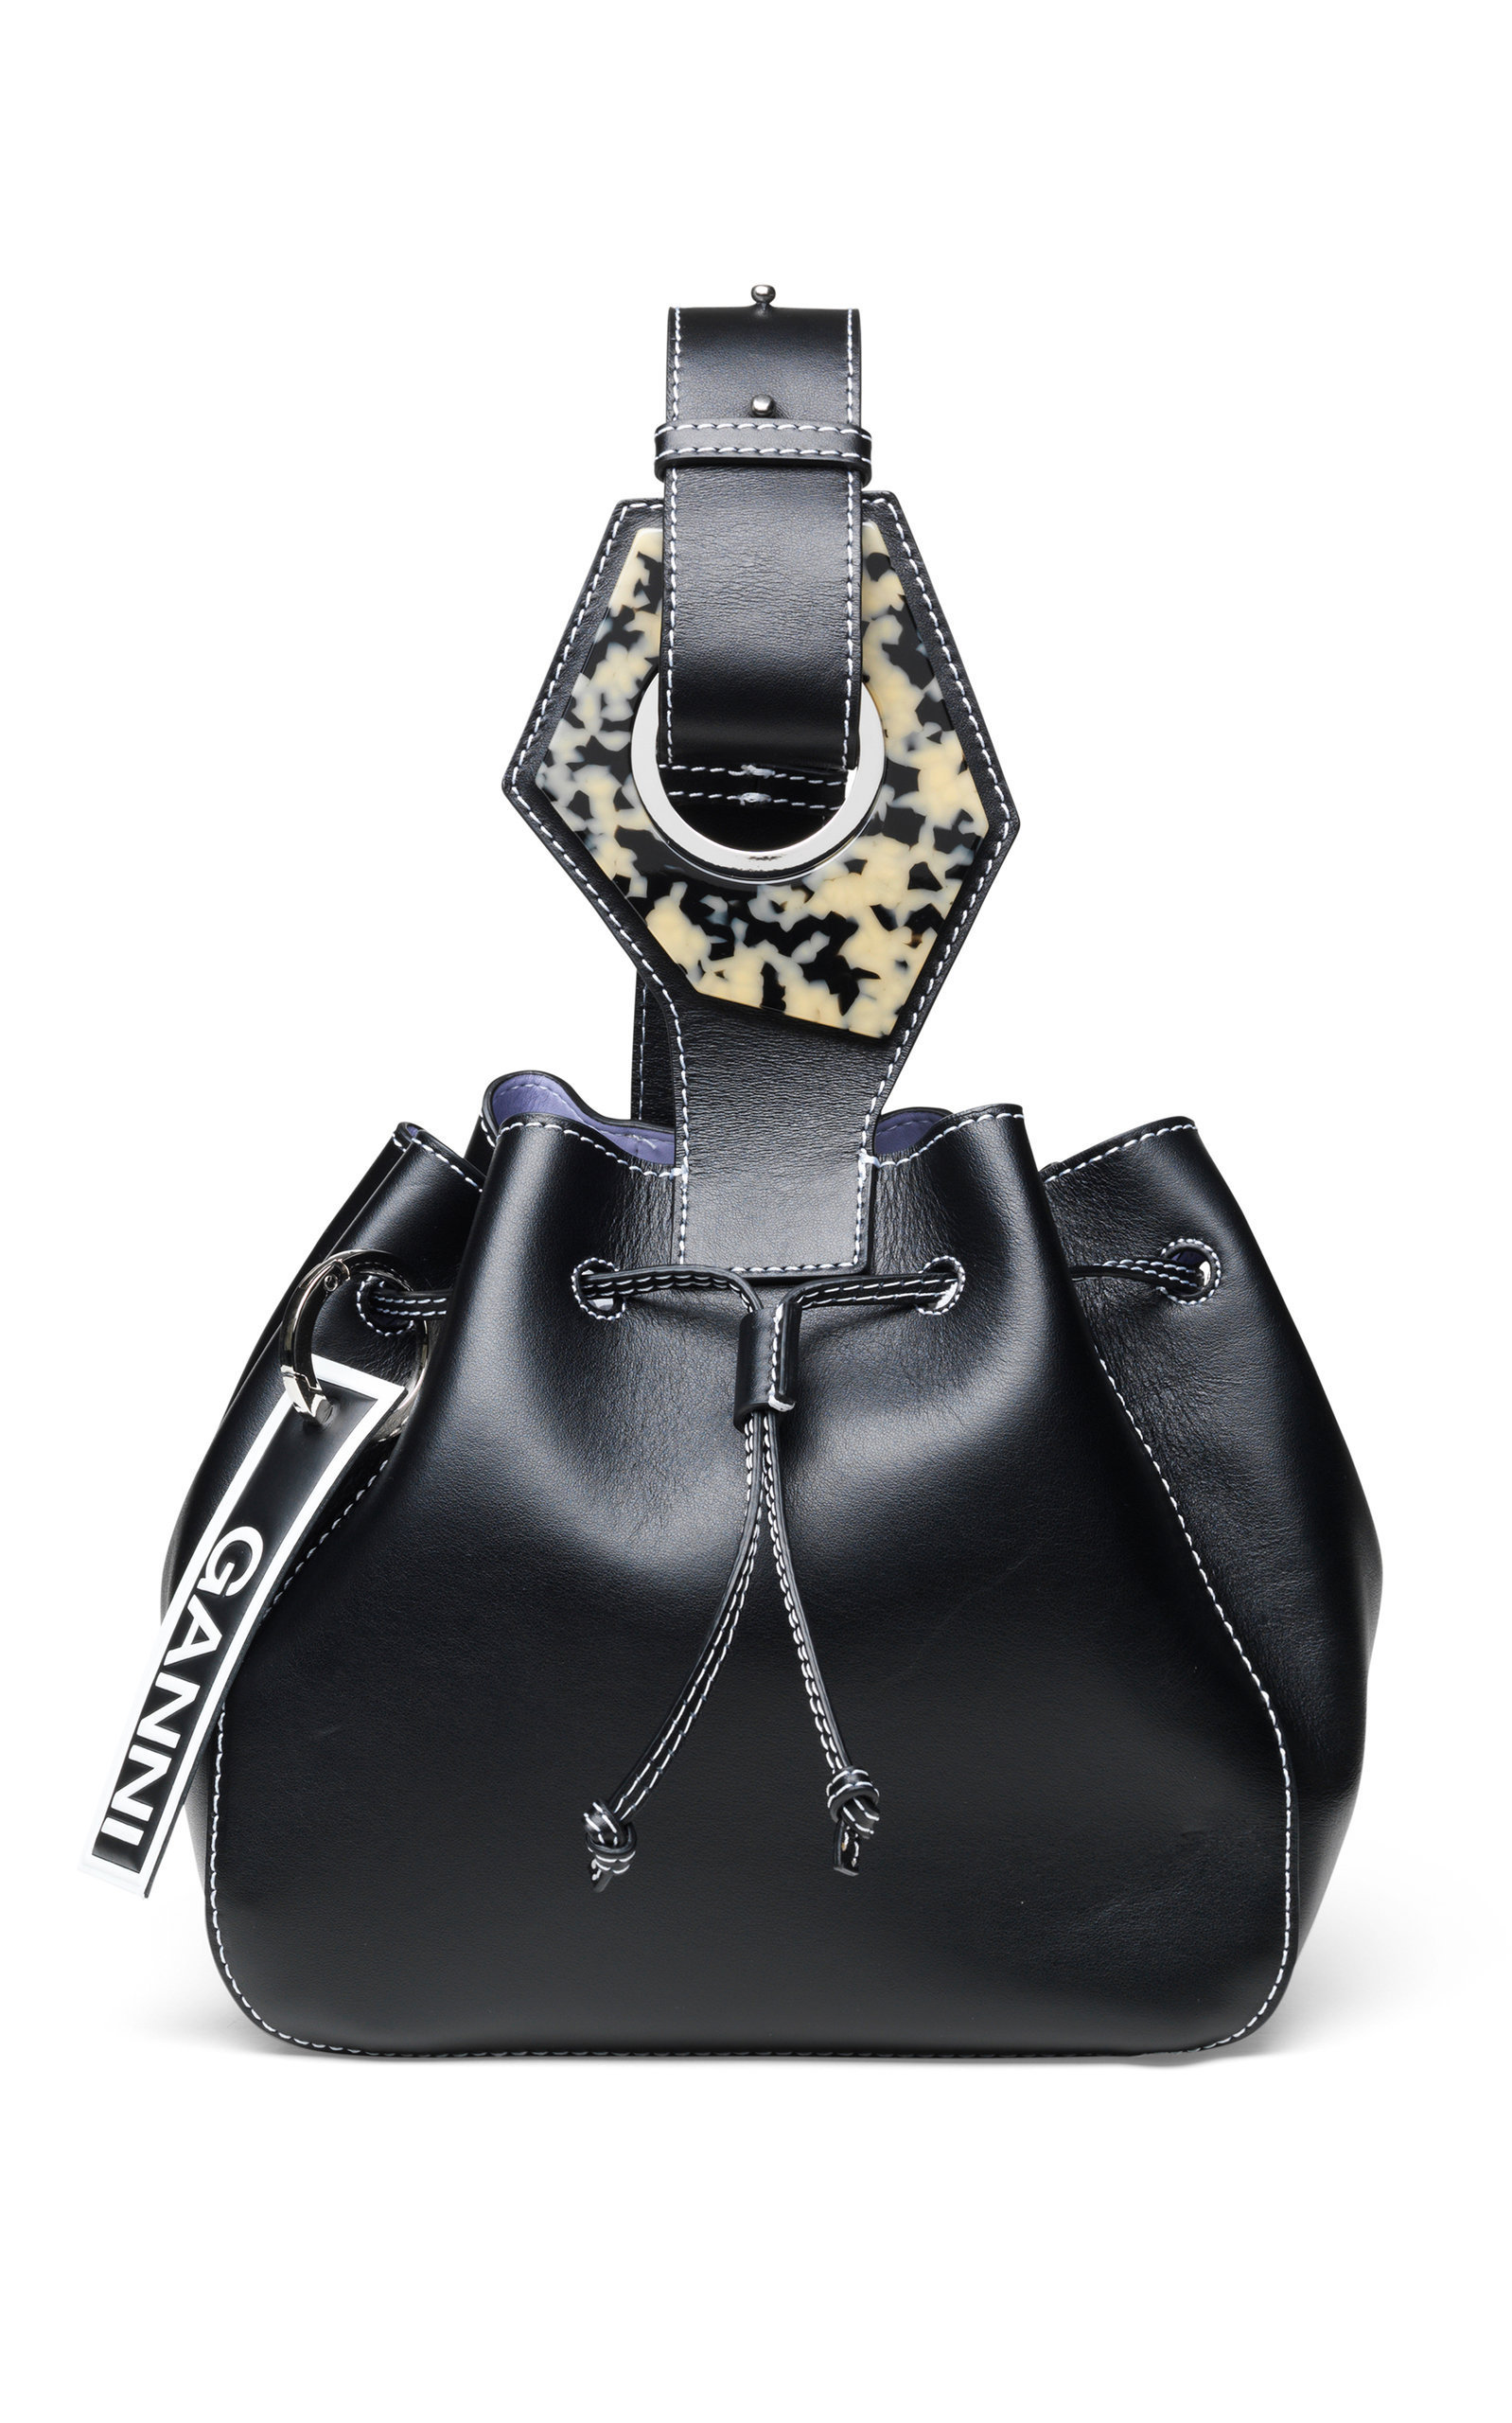 M'O Exclusive Leather Bucket Handbag